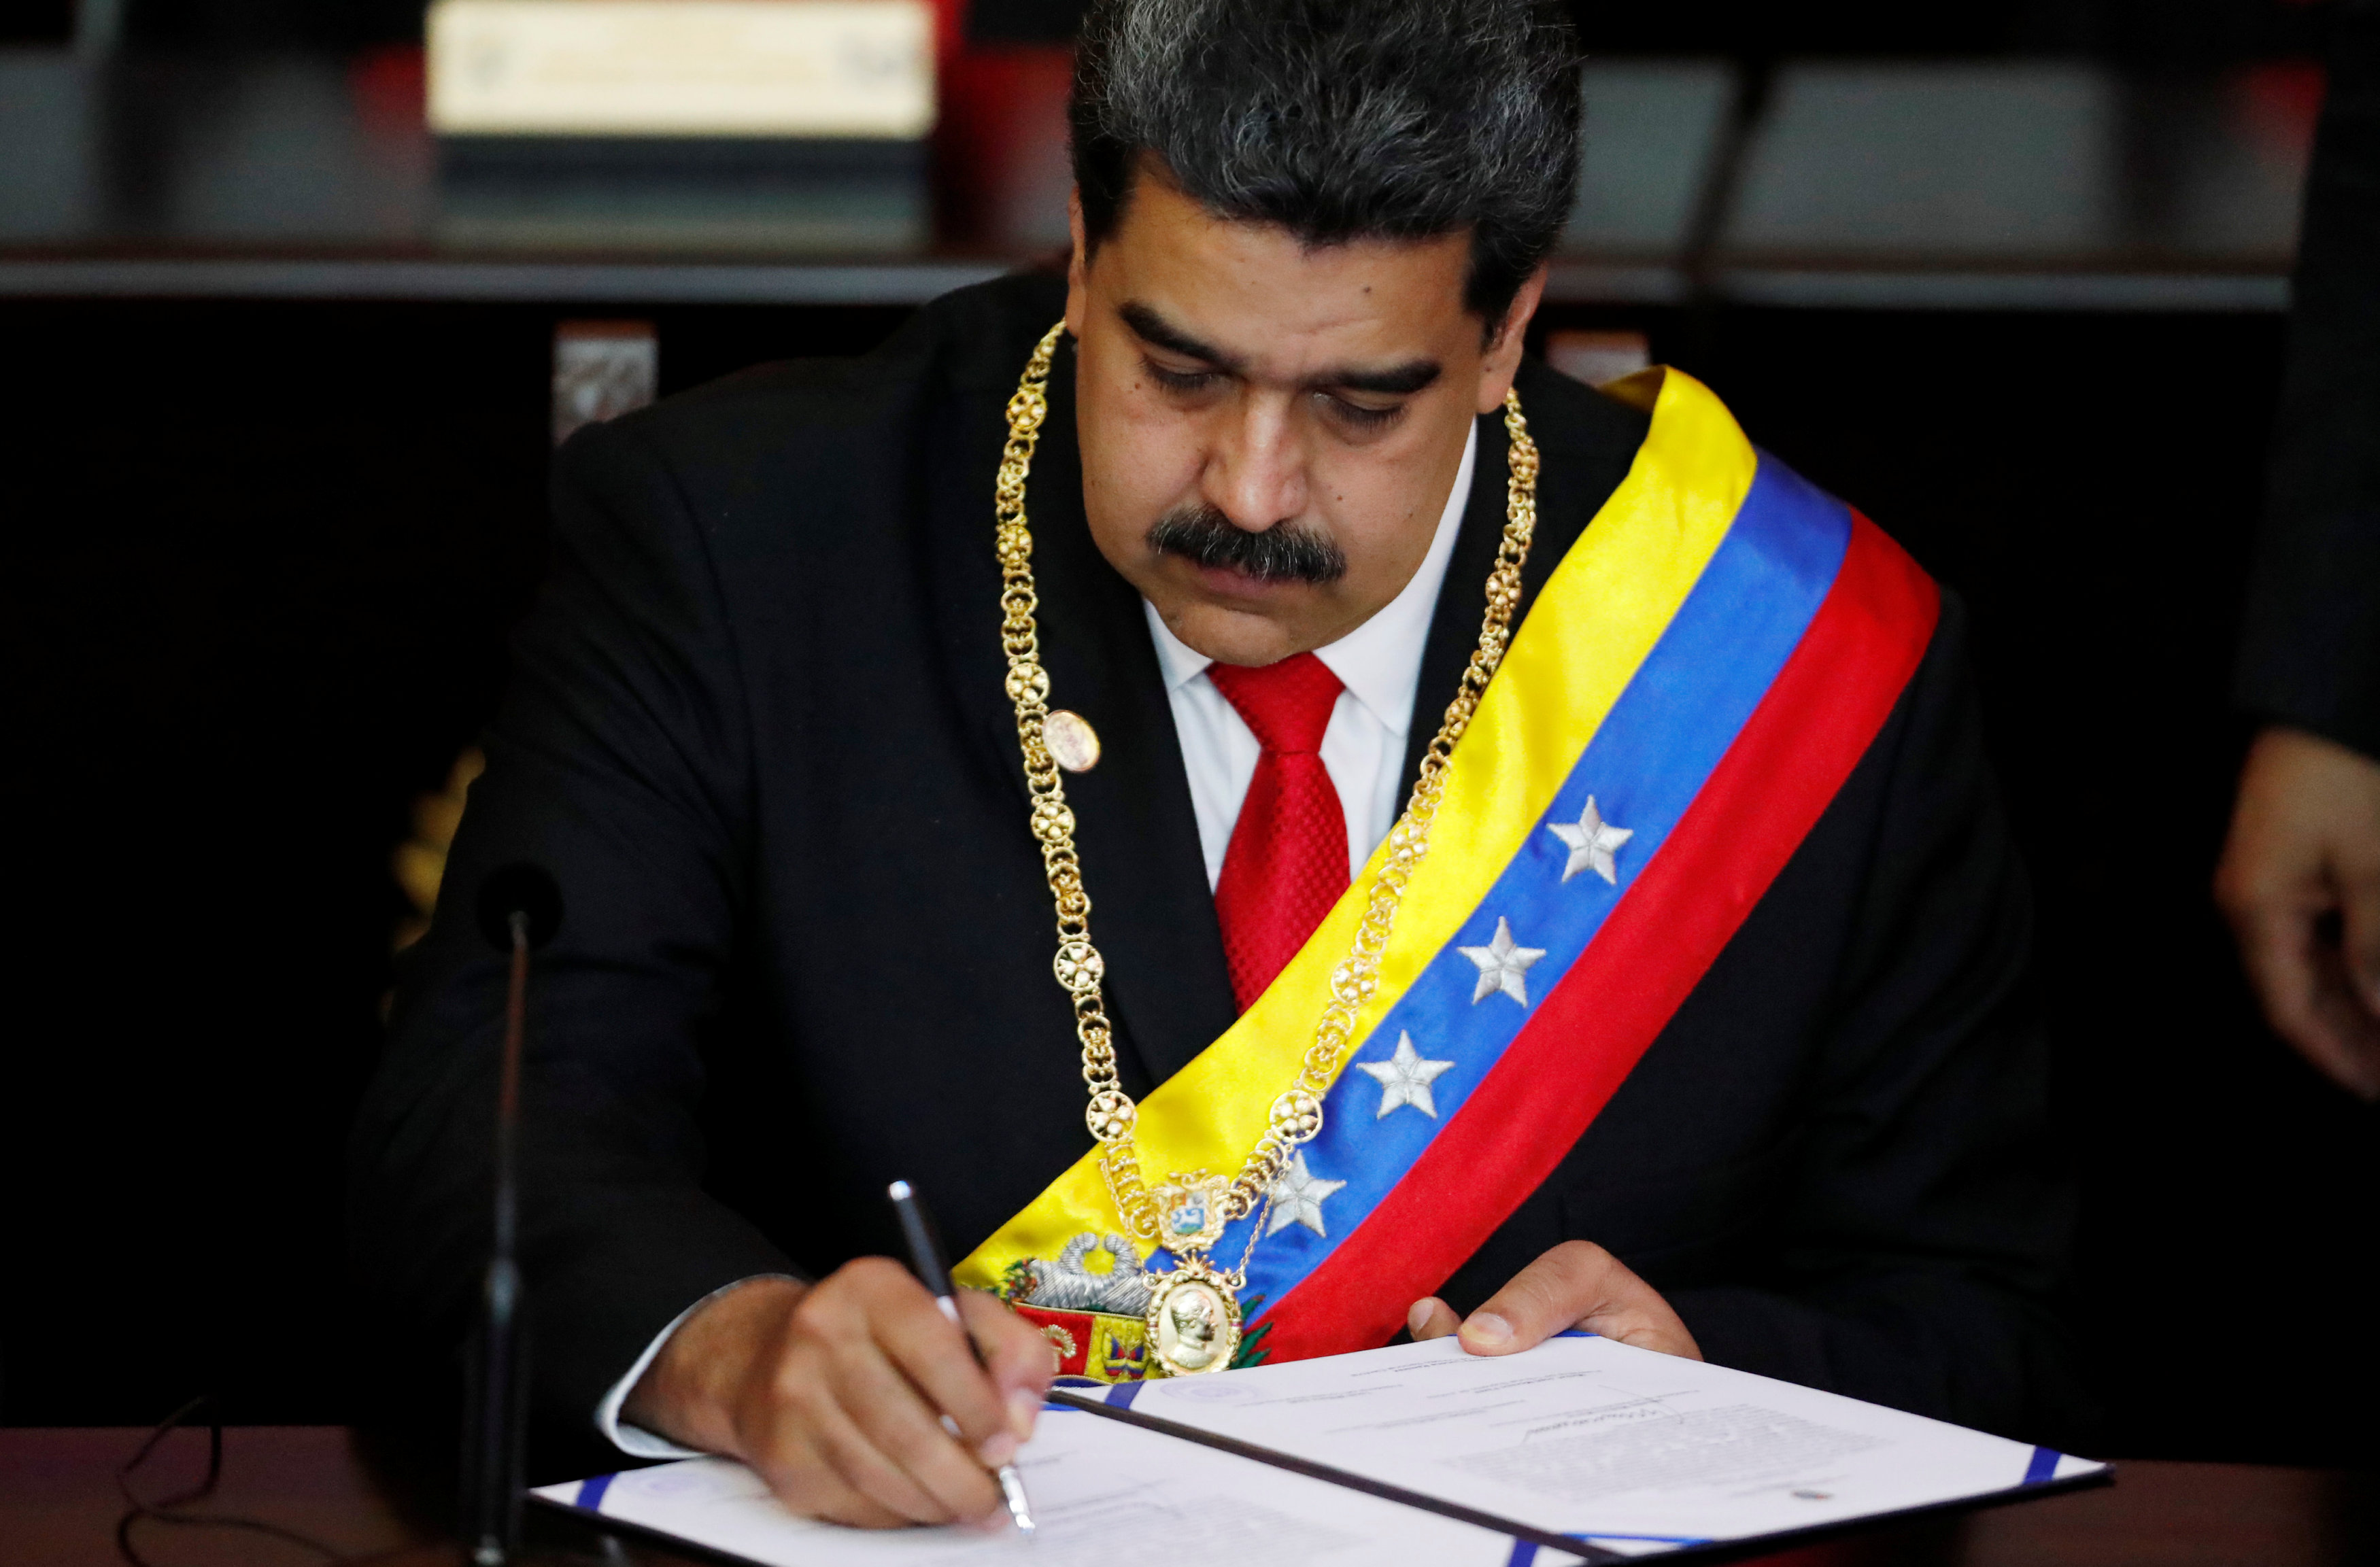 2019-01-10T180745Z_239581857_RC1C94360290_RTRMADP_3_VENEZUELA-POLITICS